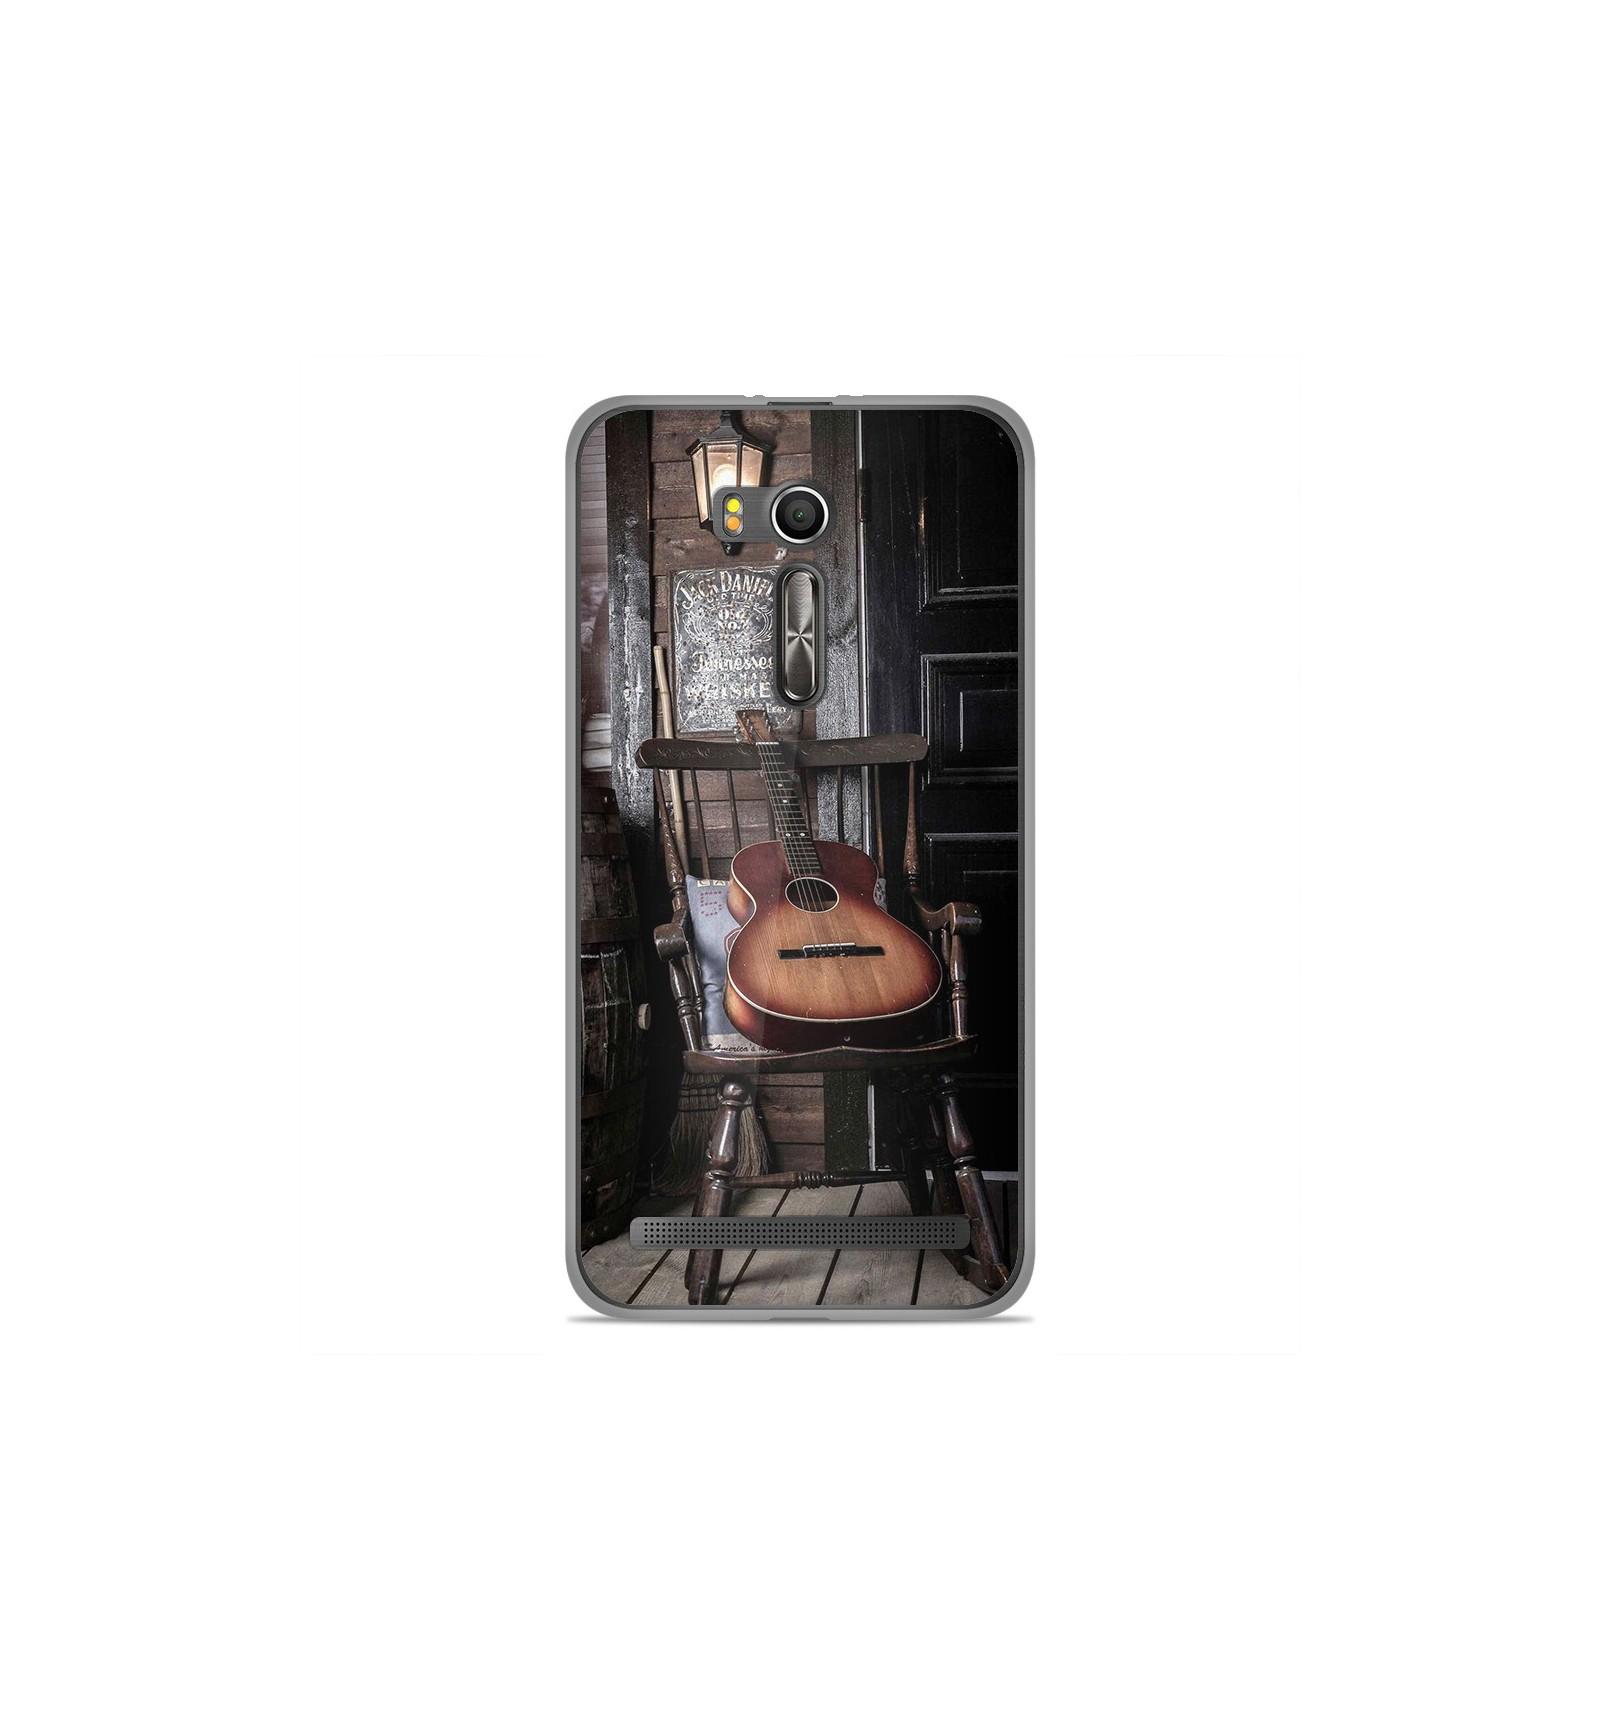 coque en silicone asus zenfone go zb552kl guitare. Black Bedroom Furniture Sets. Home Design Ideas